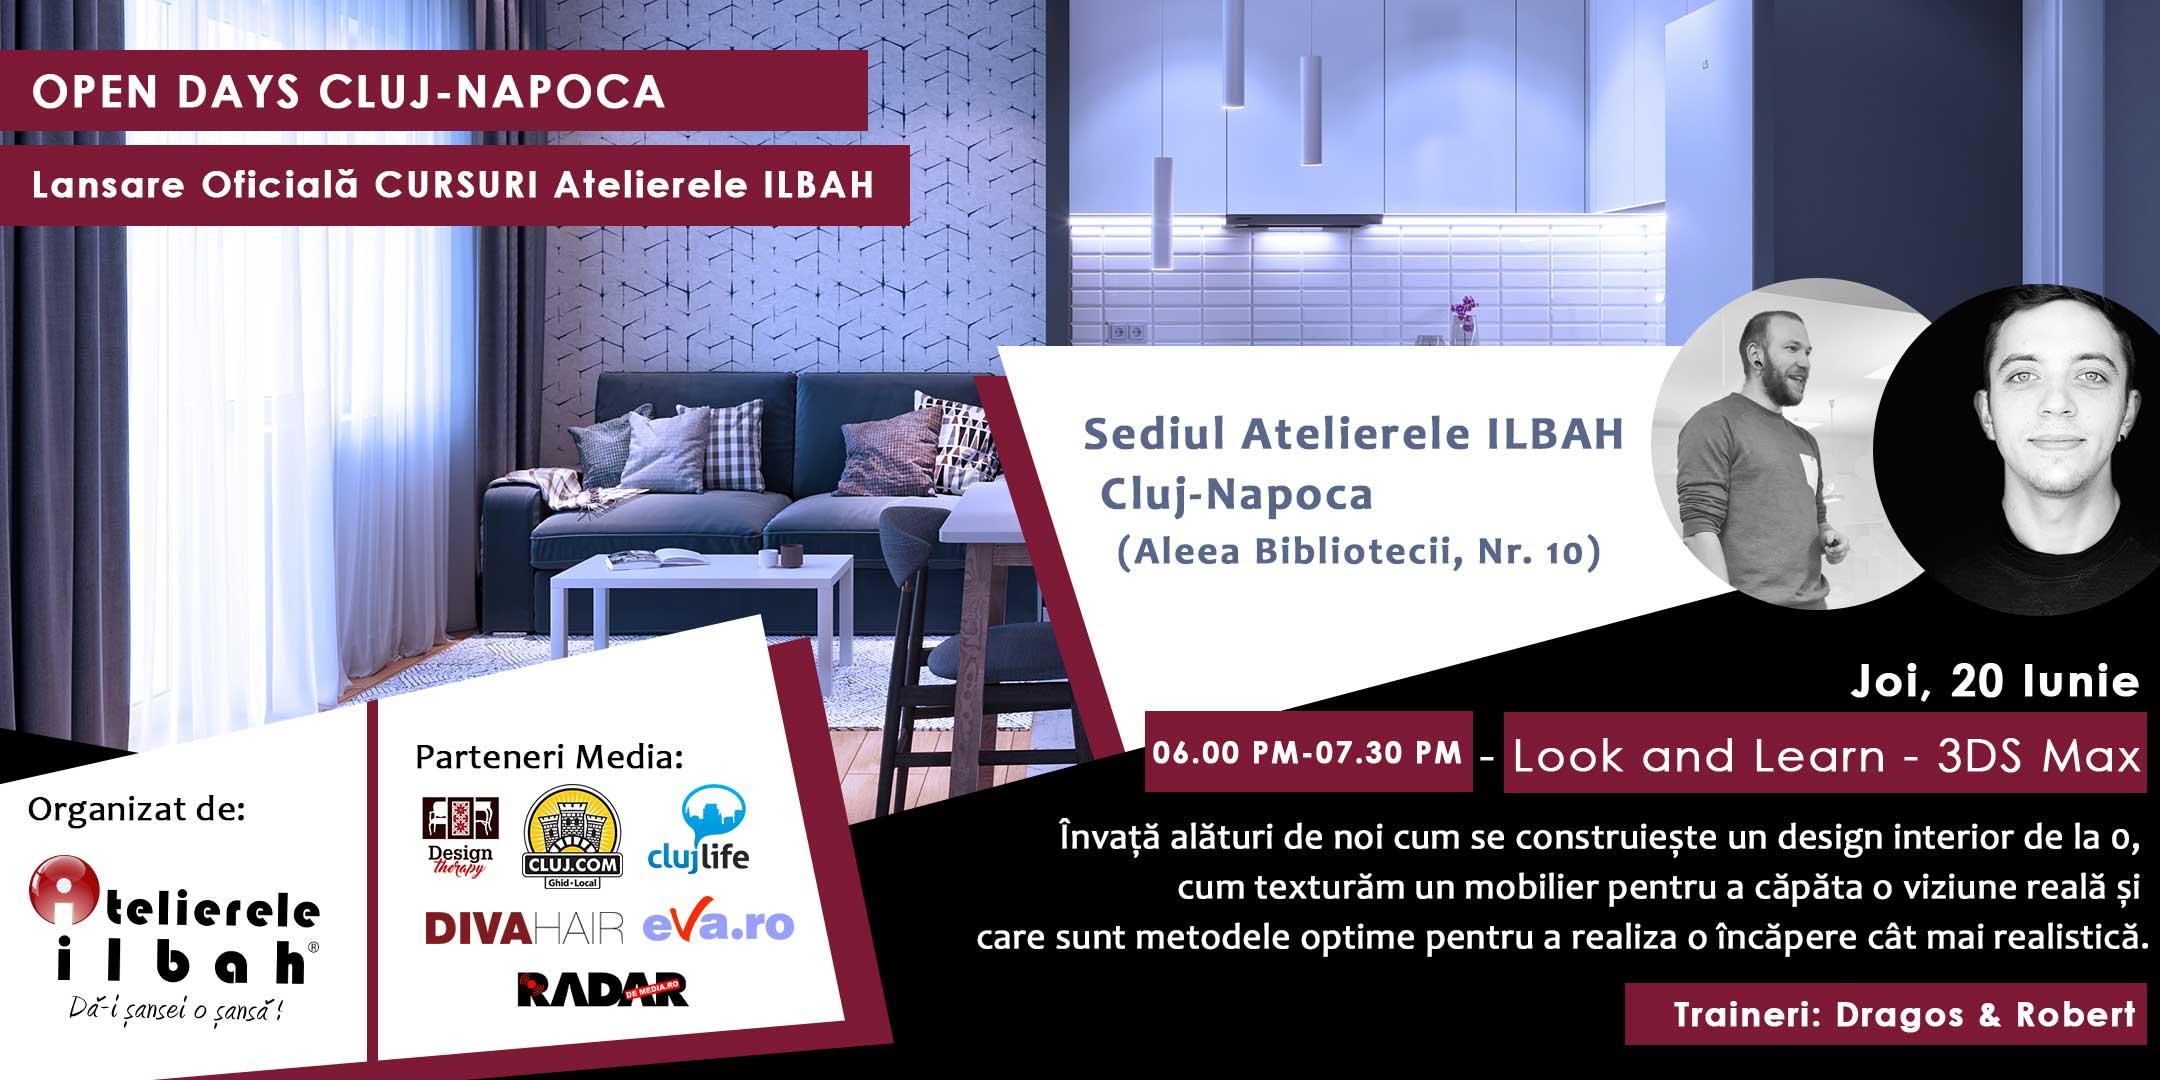 open-days-by-atelierele-ilbah-la-cluj-napoca-3ds-max